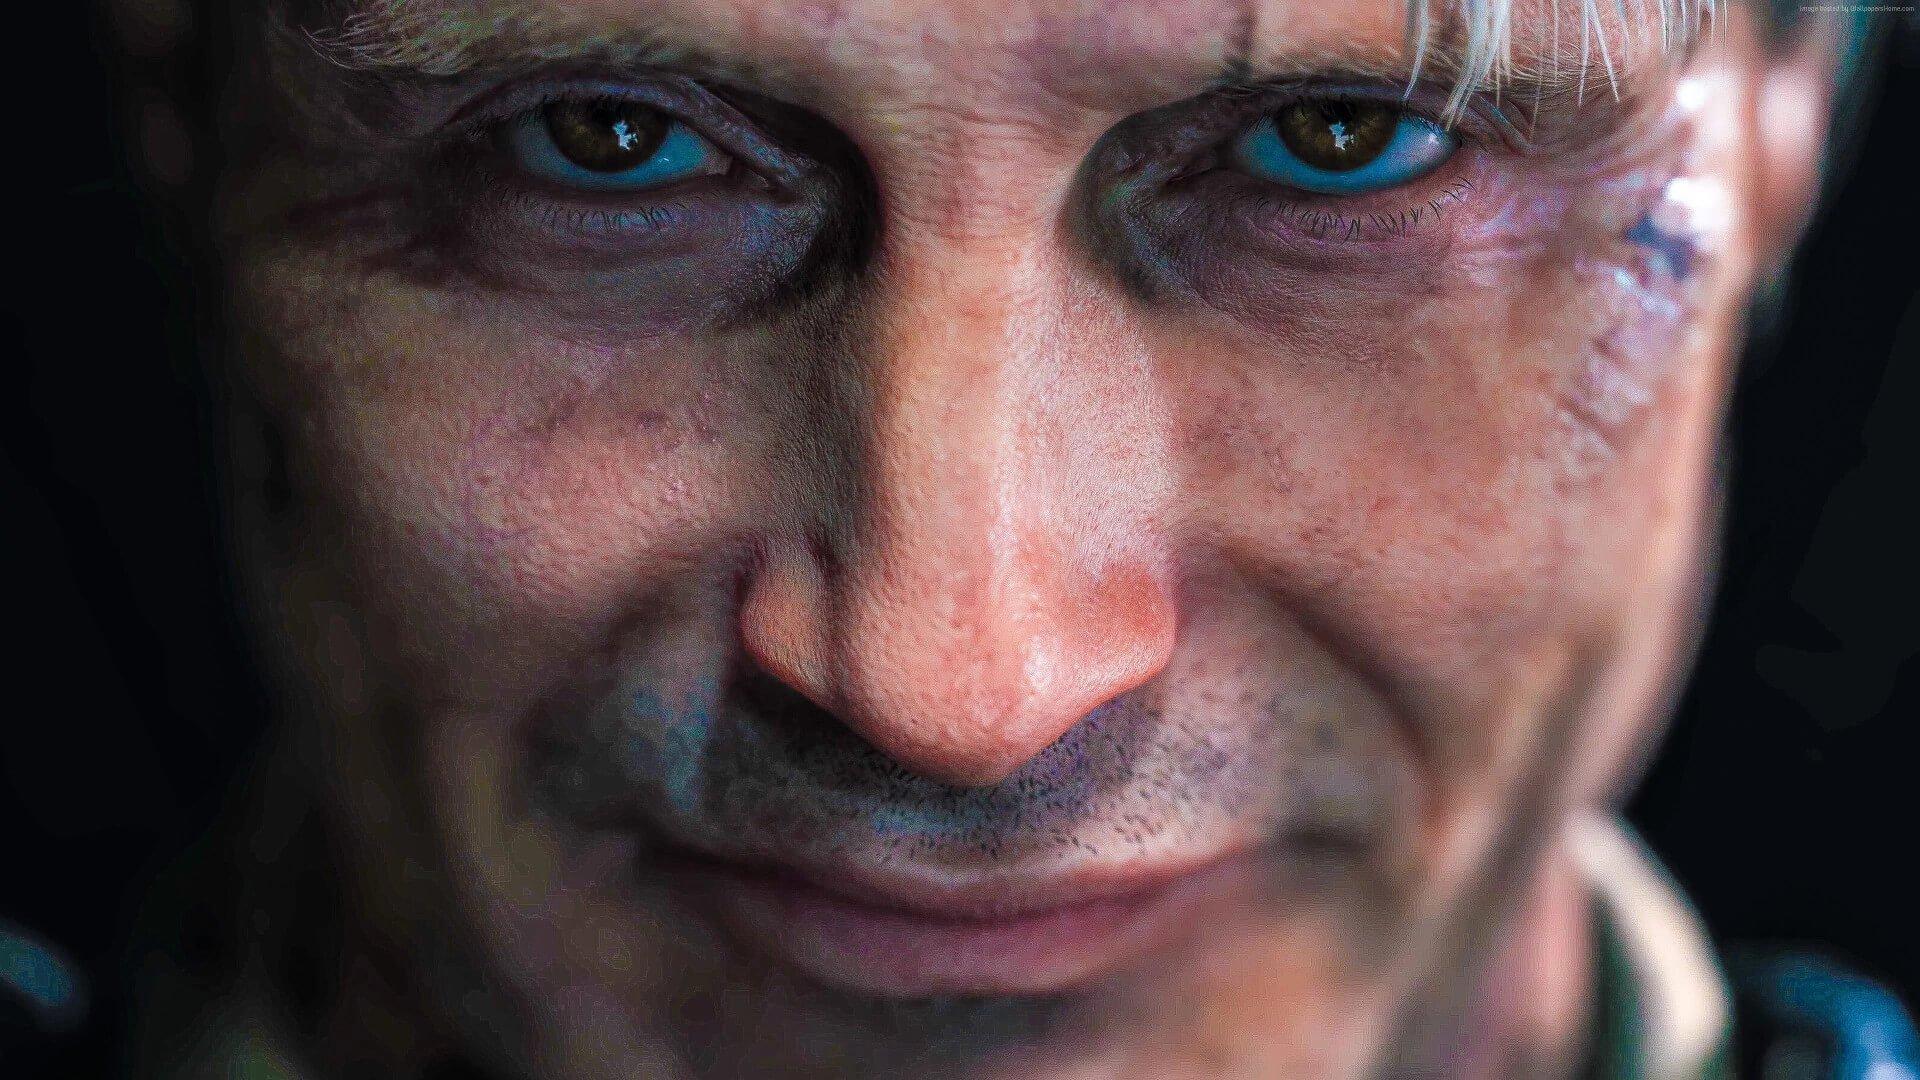 Super Smash Bros Ultimate Update 4.0 Brings Balance Changes